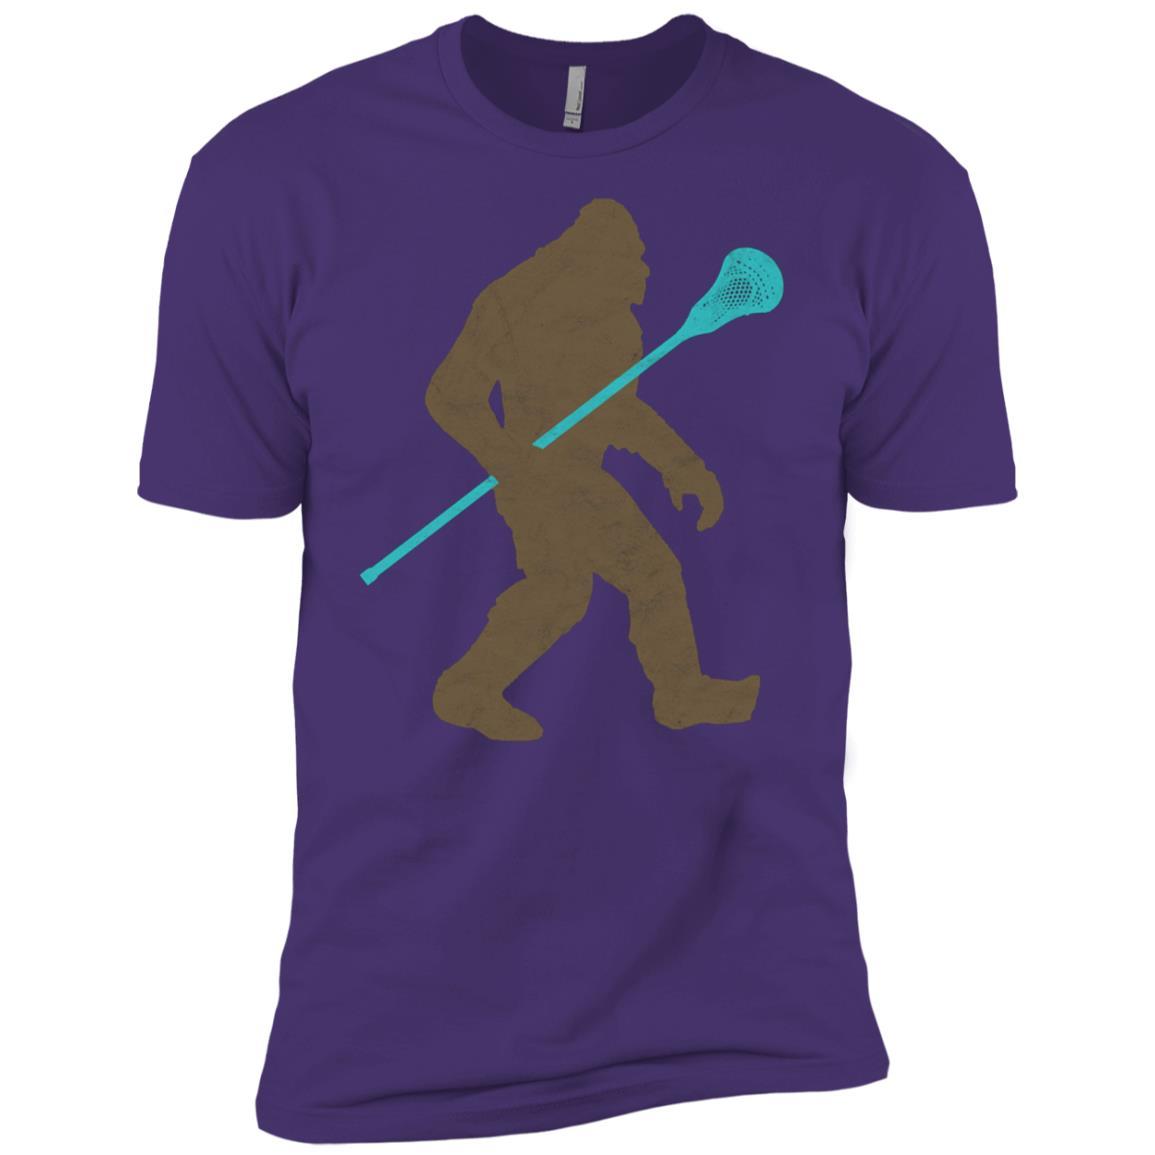 Bigfoot Lacrosse Stick Vintage Funny Lax -1 Men Short Sleeve T-Shirt